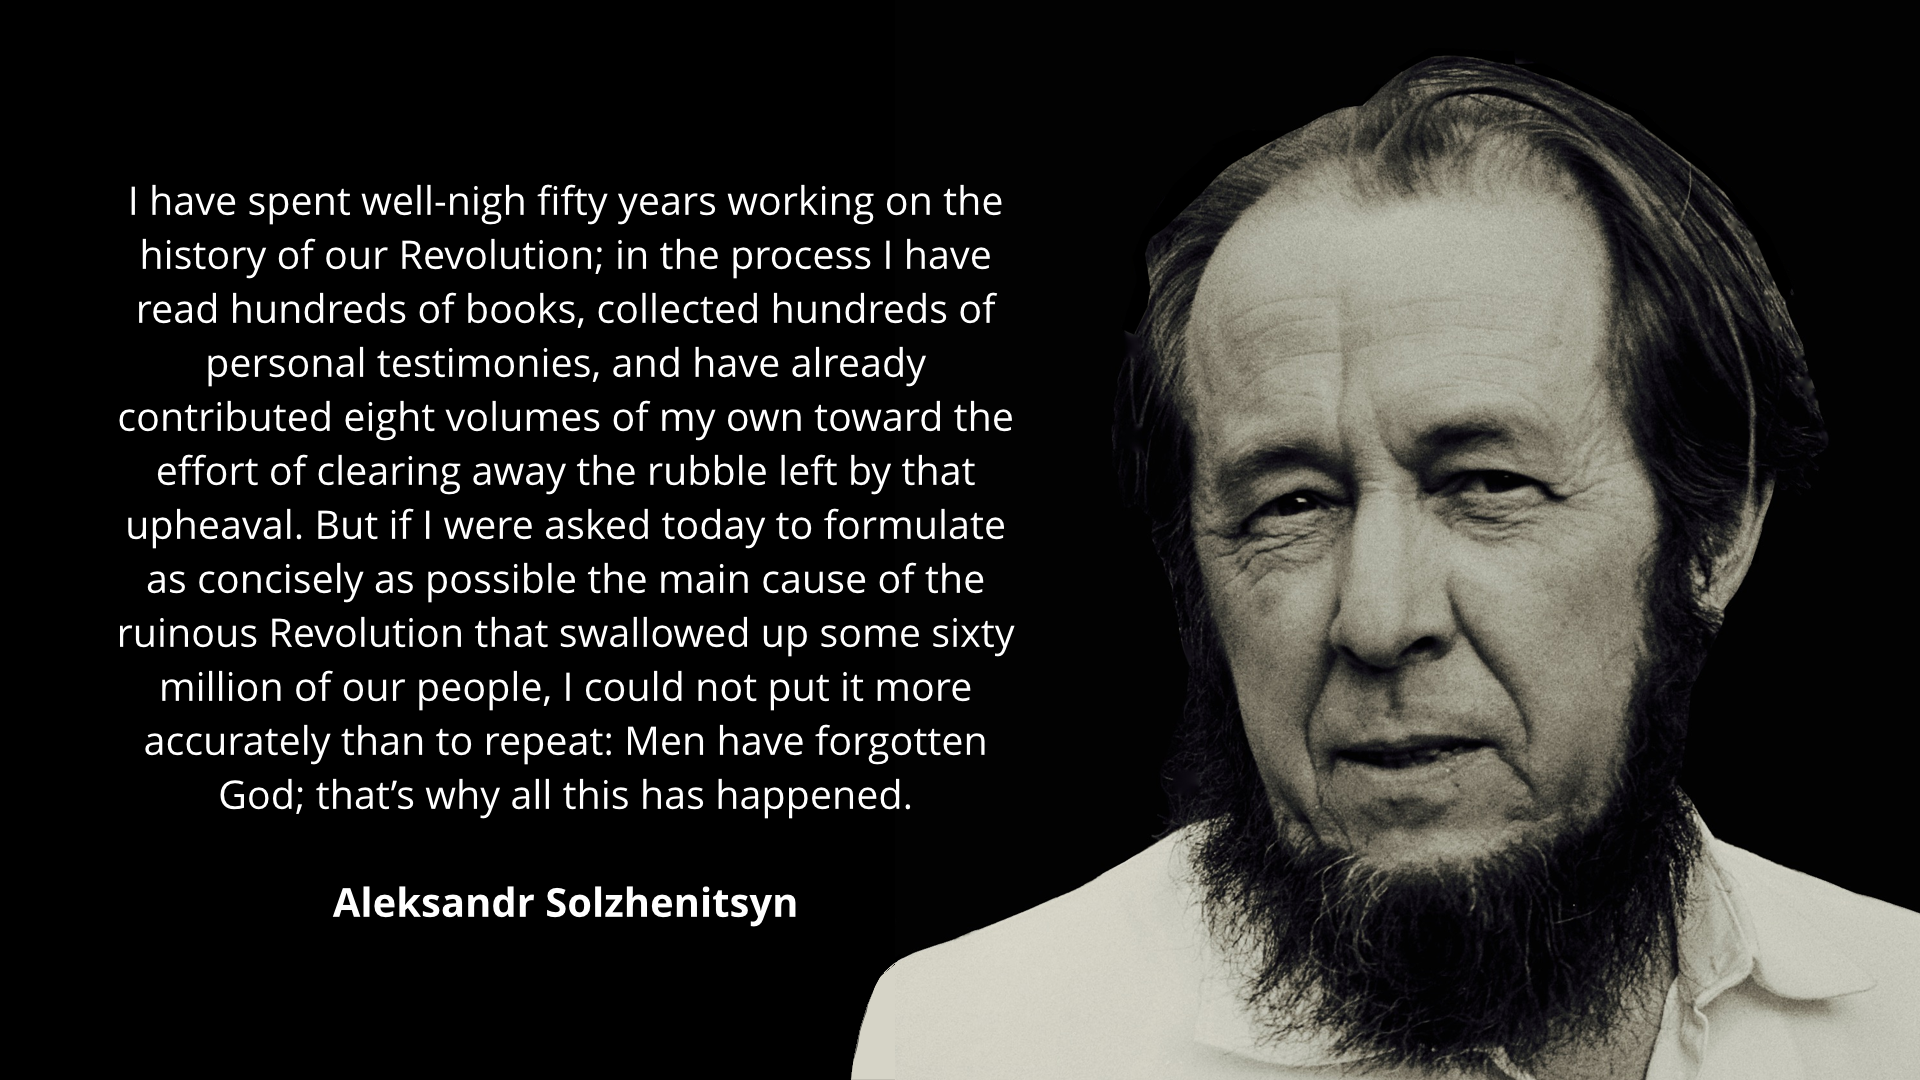 Solzhenitsyn Quotes Facebook thumbnail